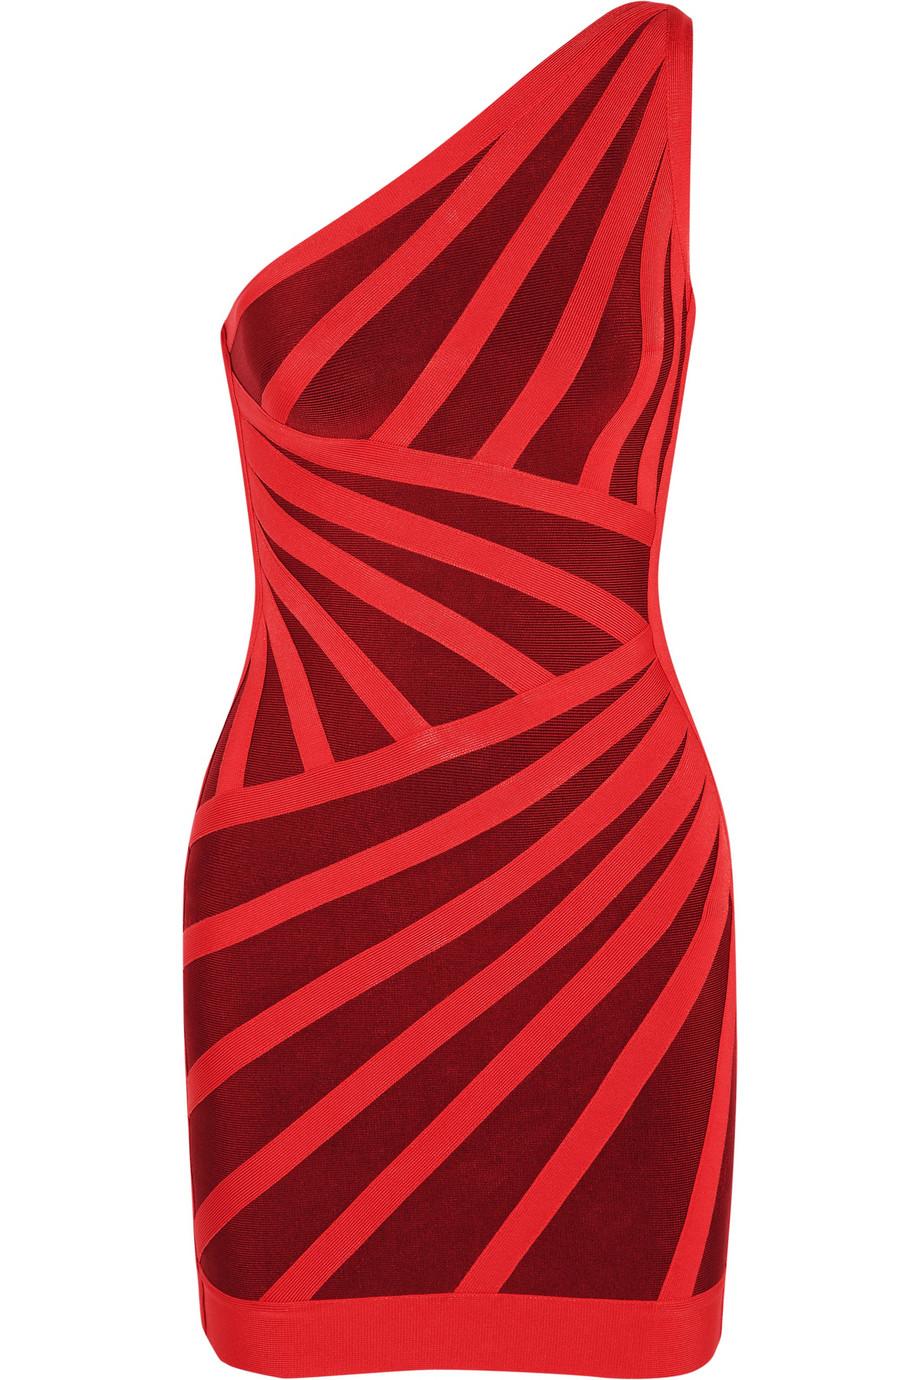 Asymmetric bandage dress | Hervé Léger | 60% off | THE OUTNET